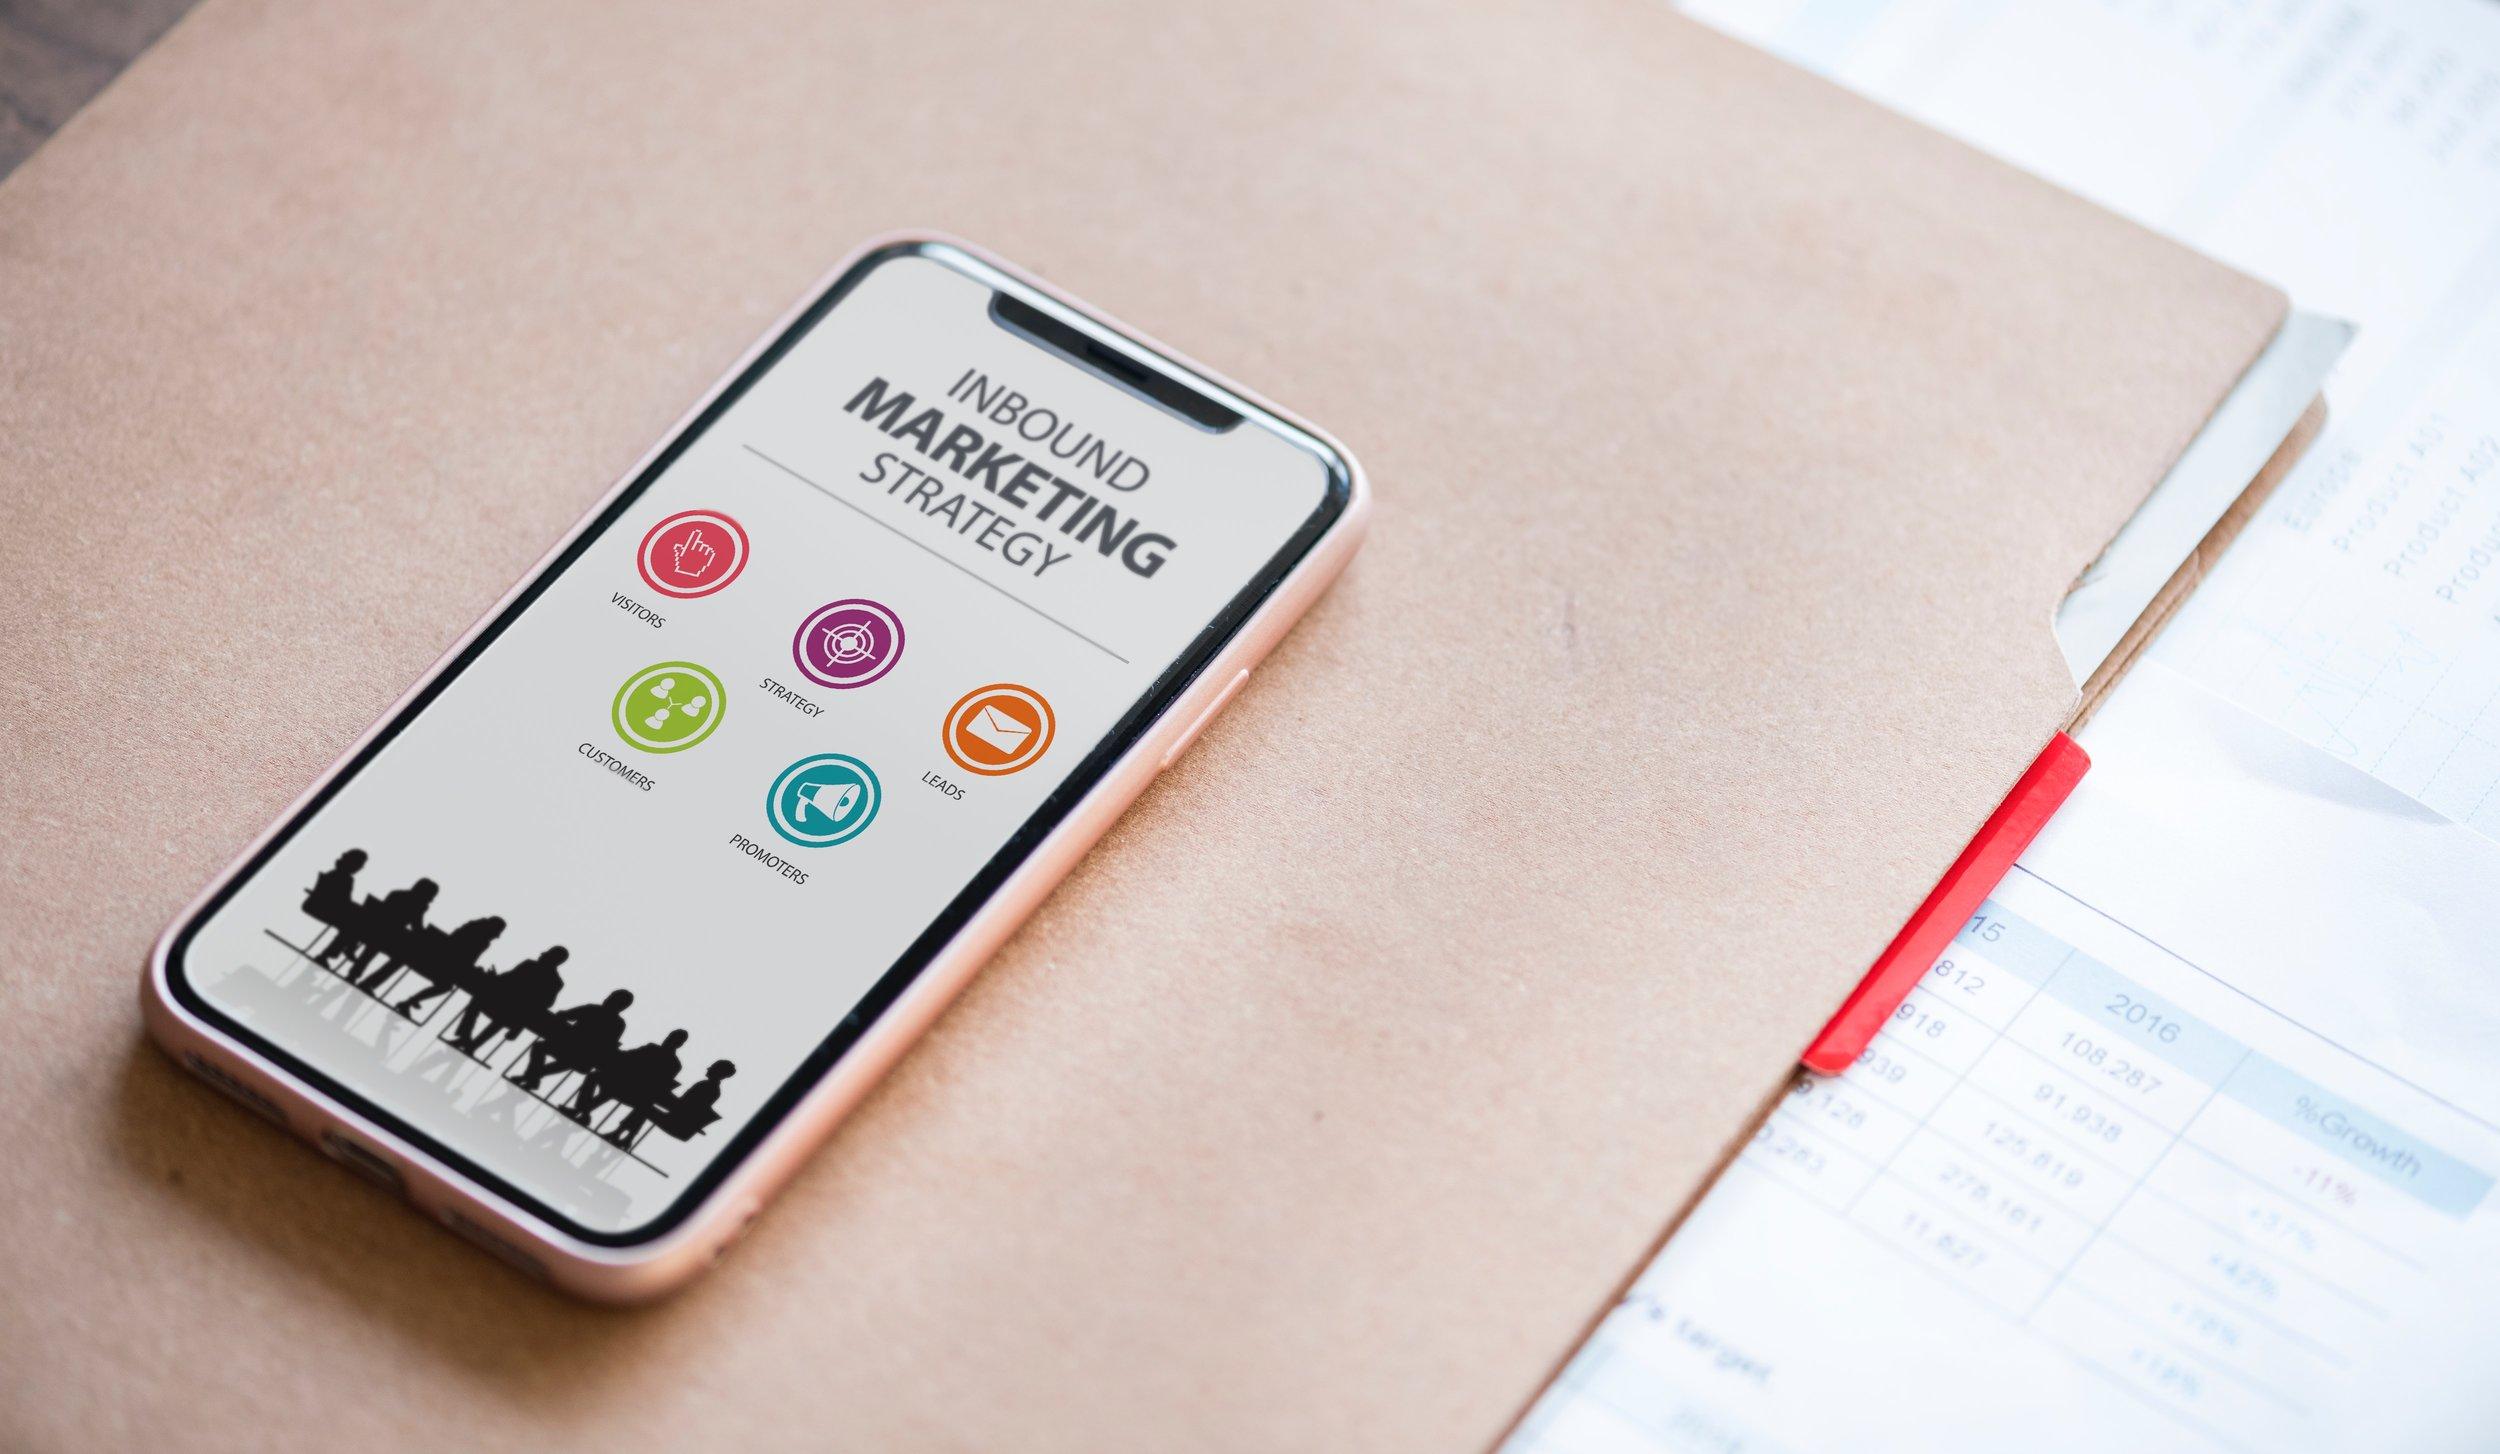 cellphone-device-digital-marketing-893893.jpg